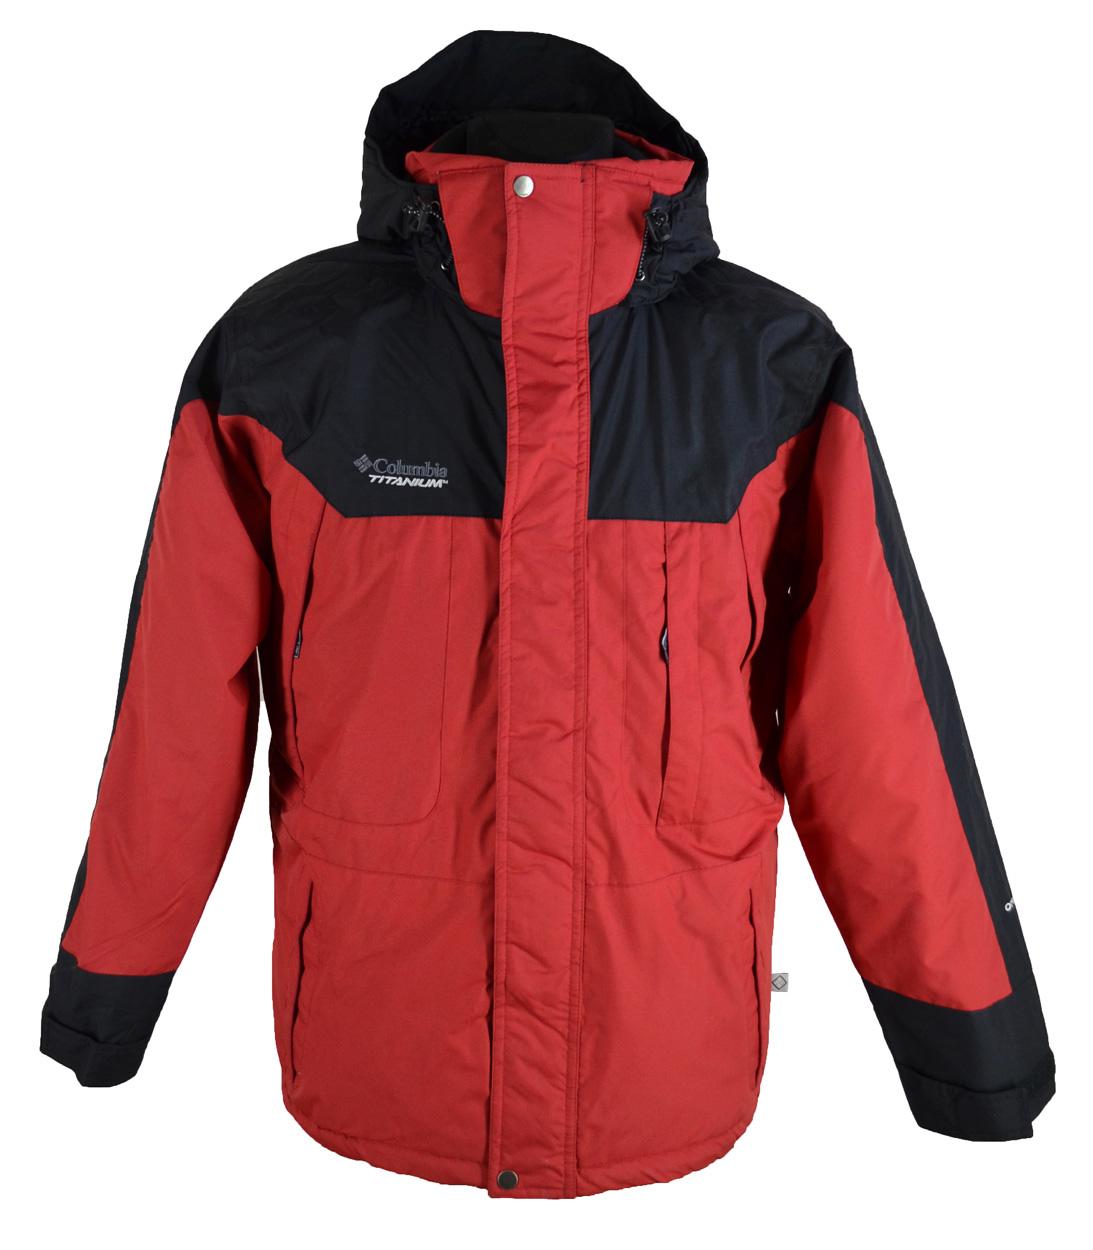 f4d18ab6672 Куртки Columbia Omni-Tech. Куртки Коламбия в Украине